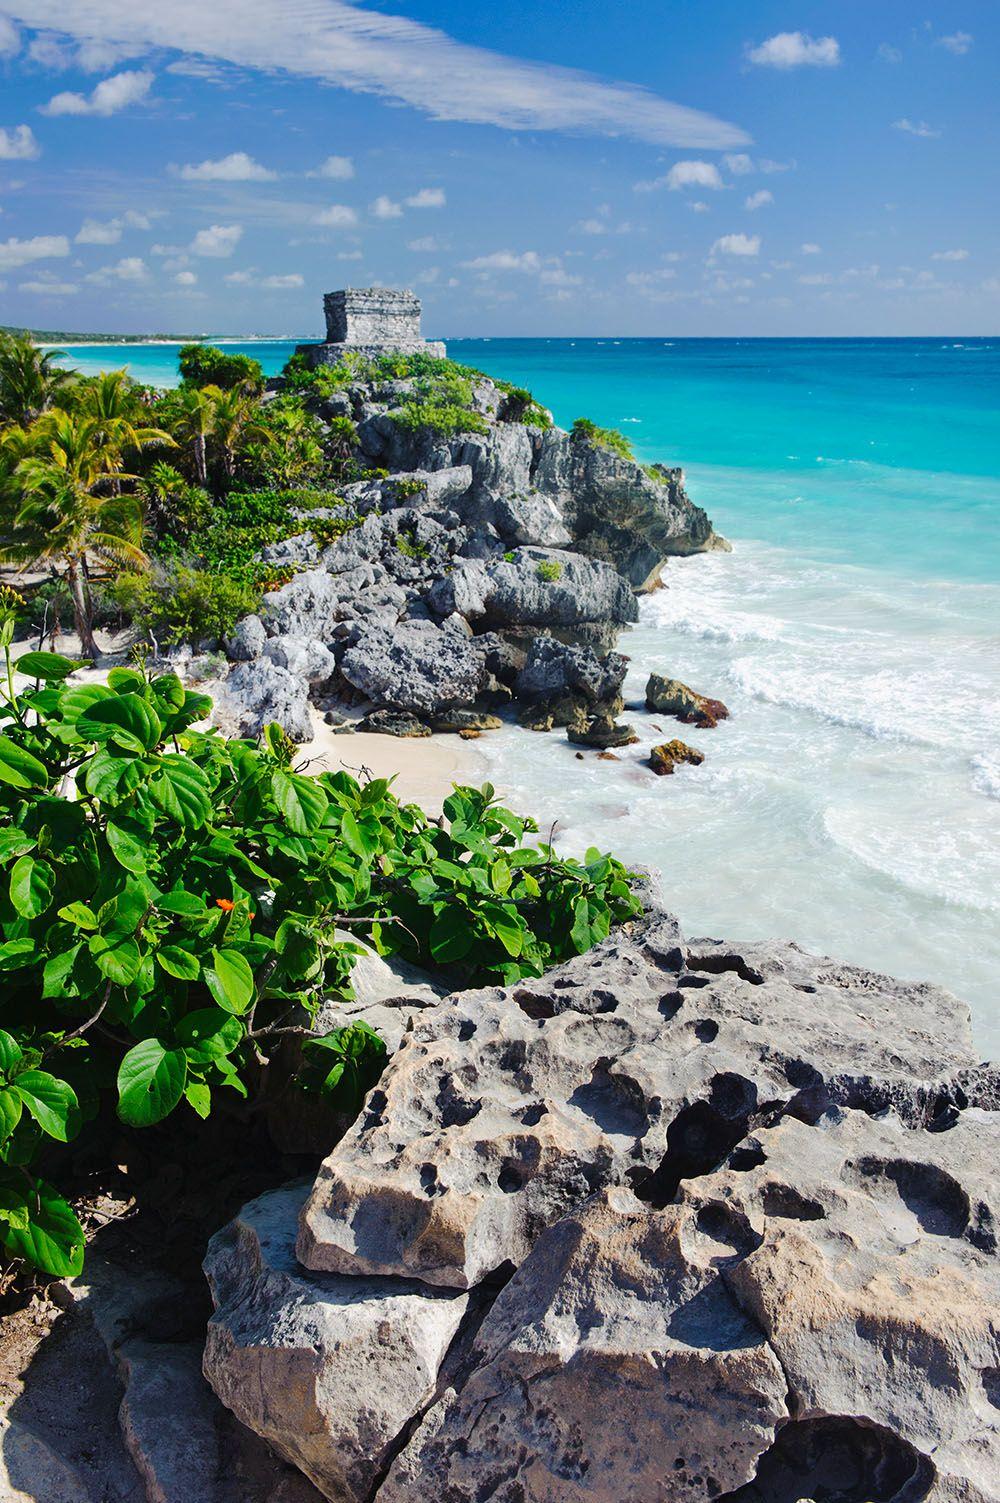 Mexico Yucatan Tulum Strand C Getty Images Bildnr 432309 Mexiko Reisen Mexiko Urlaub Schone Orte